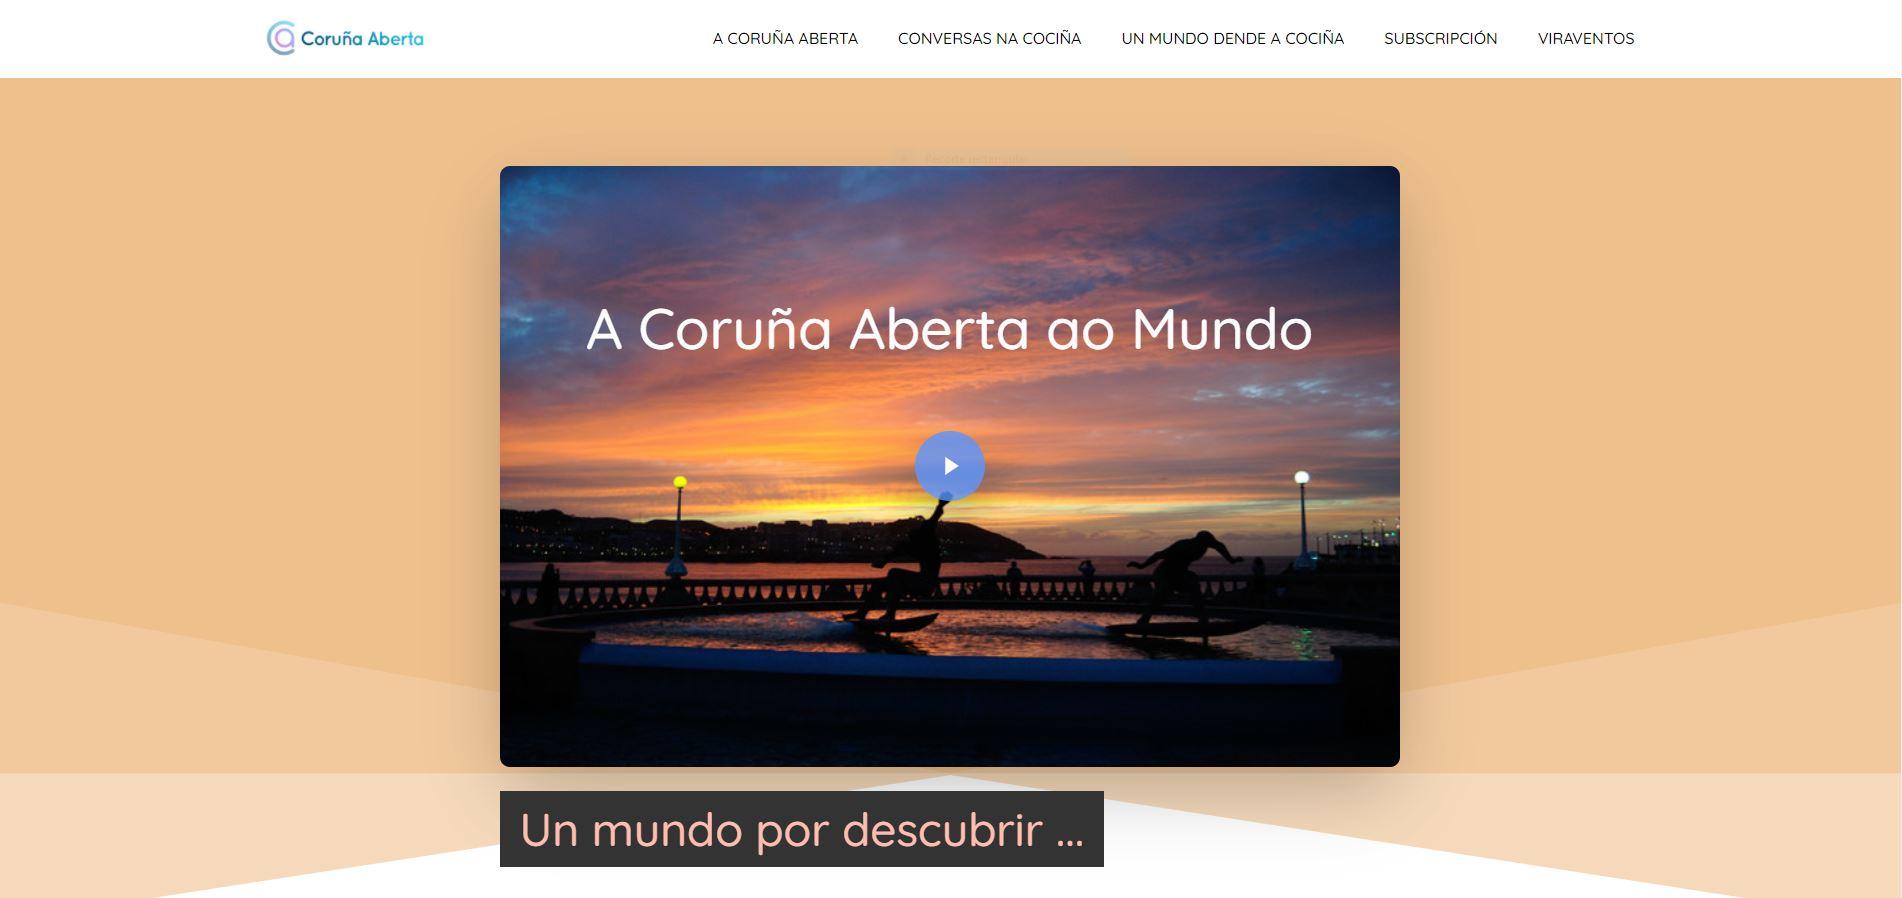 www.corunaaberta.com